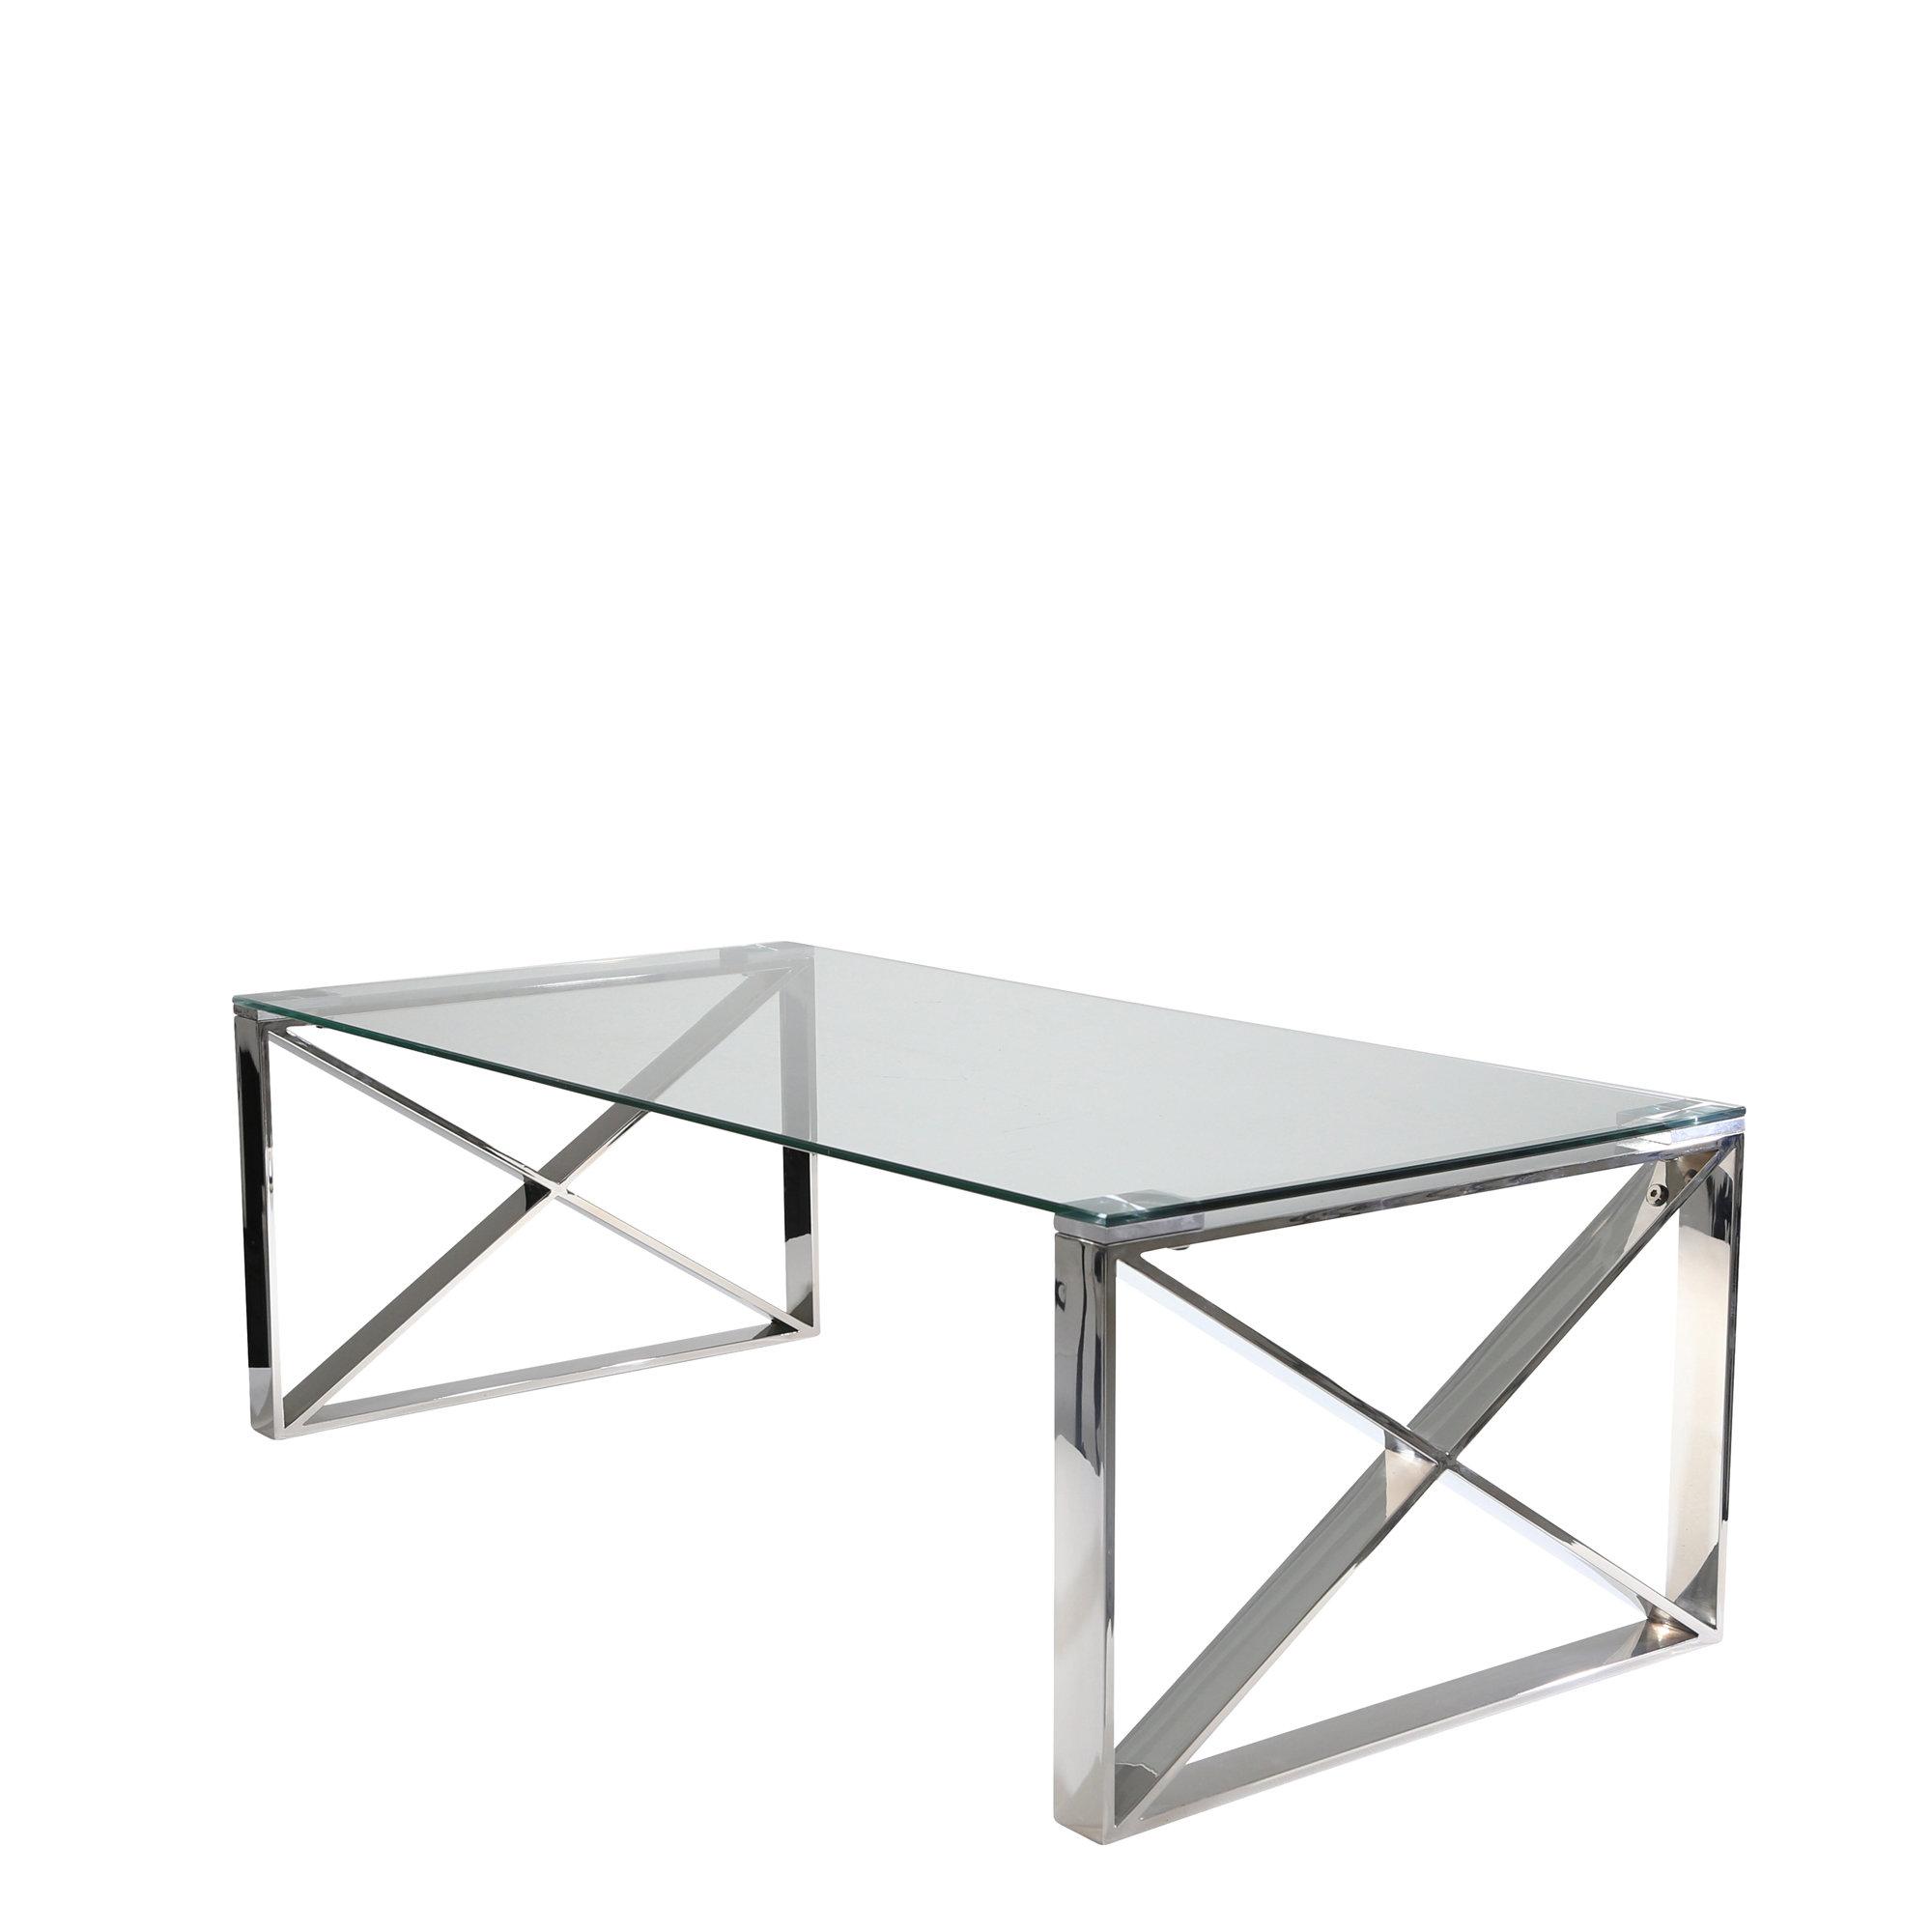 Sagebrook Home Stainless Steel And Glass Coffee Table | Wayfair